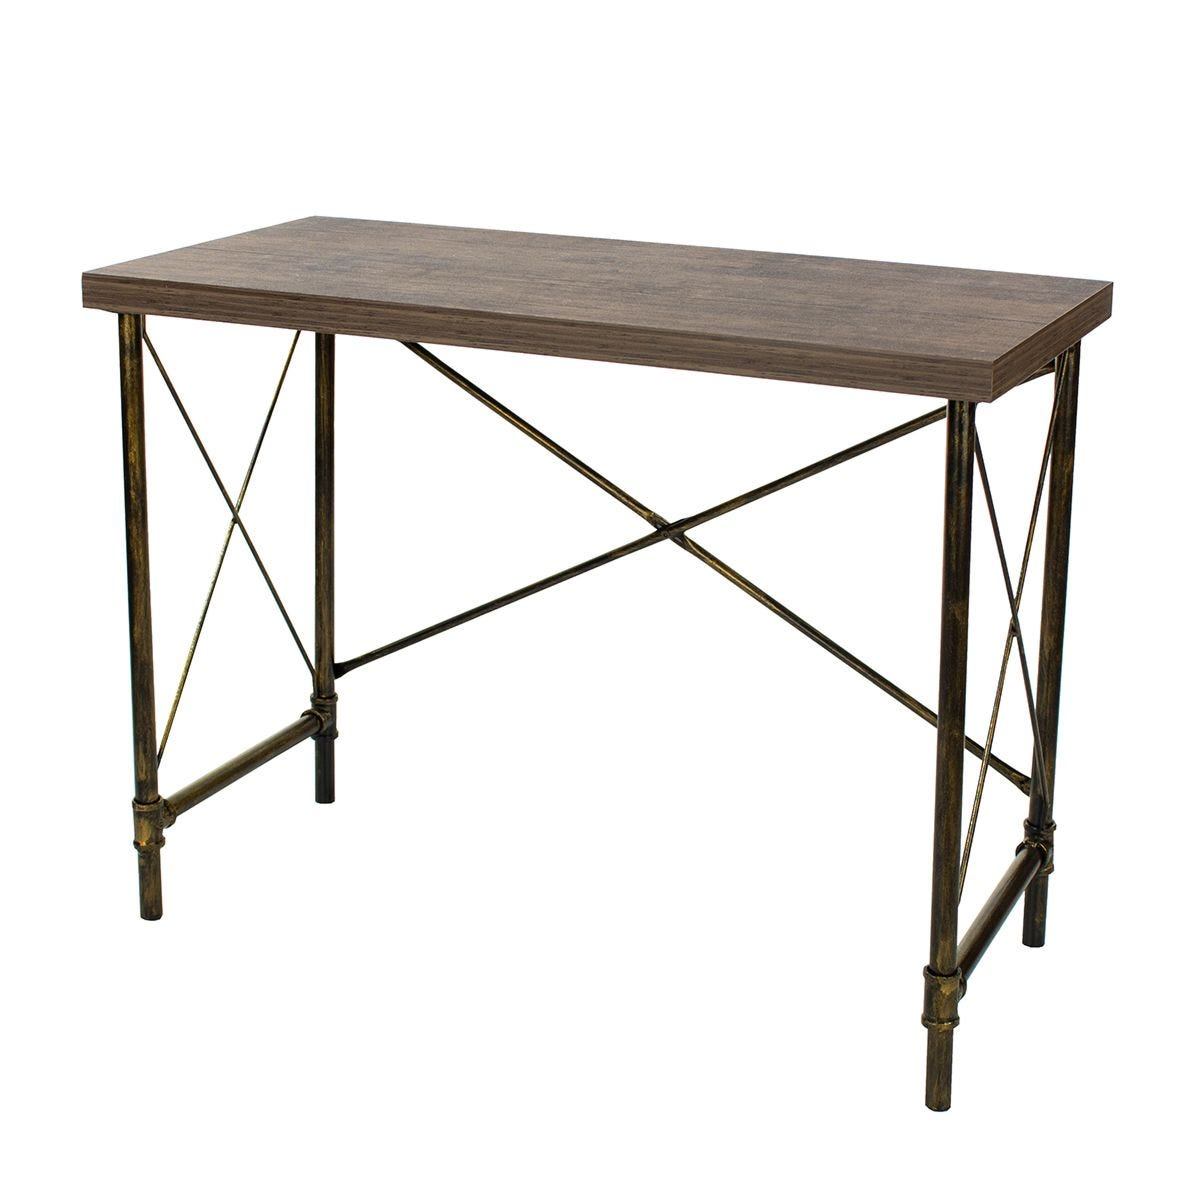 Gela Loft Home Study Desk with Pipe Design